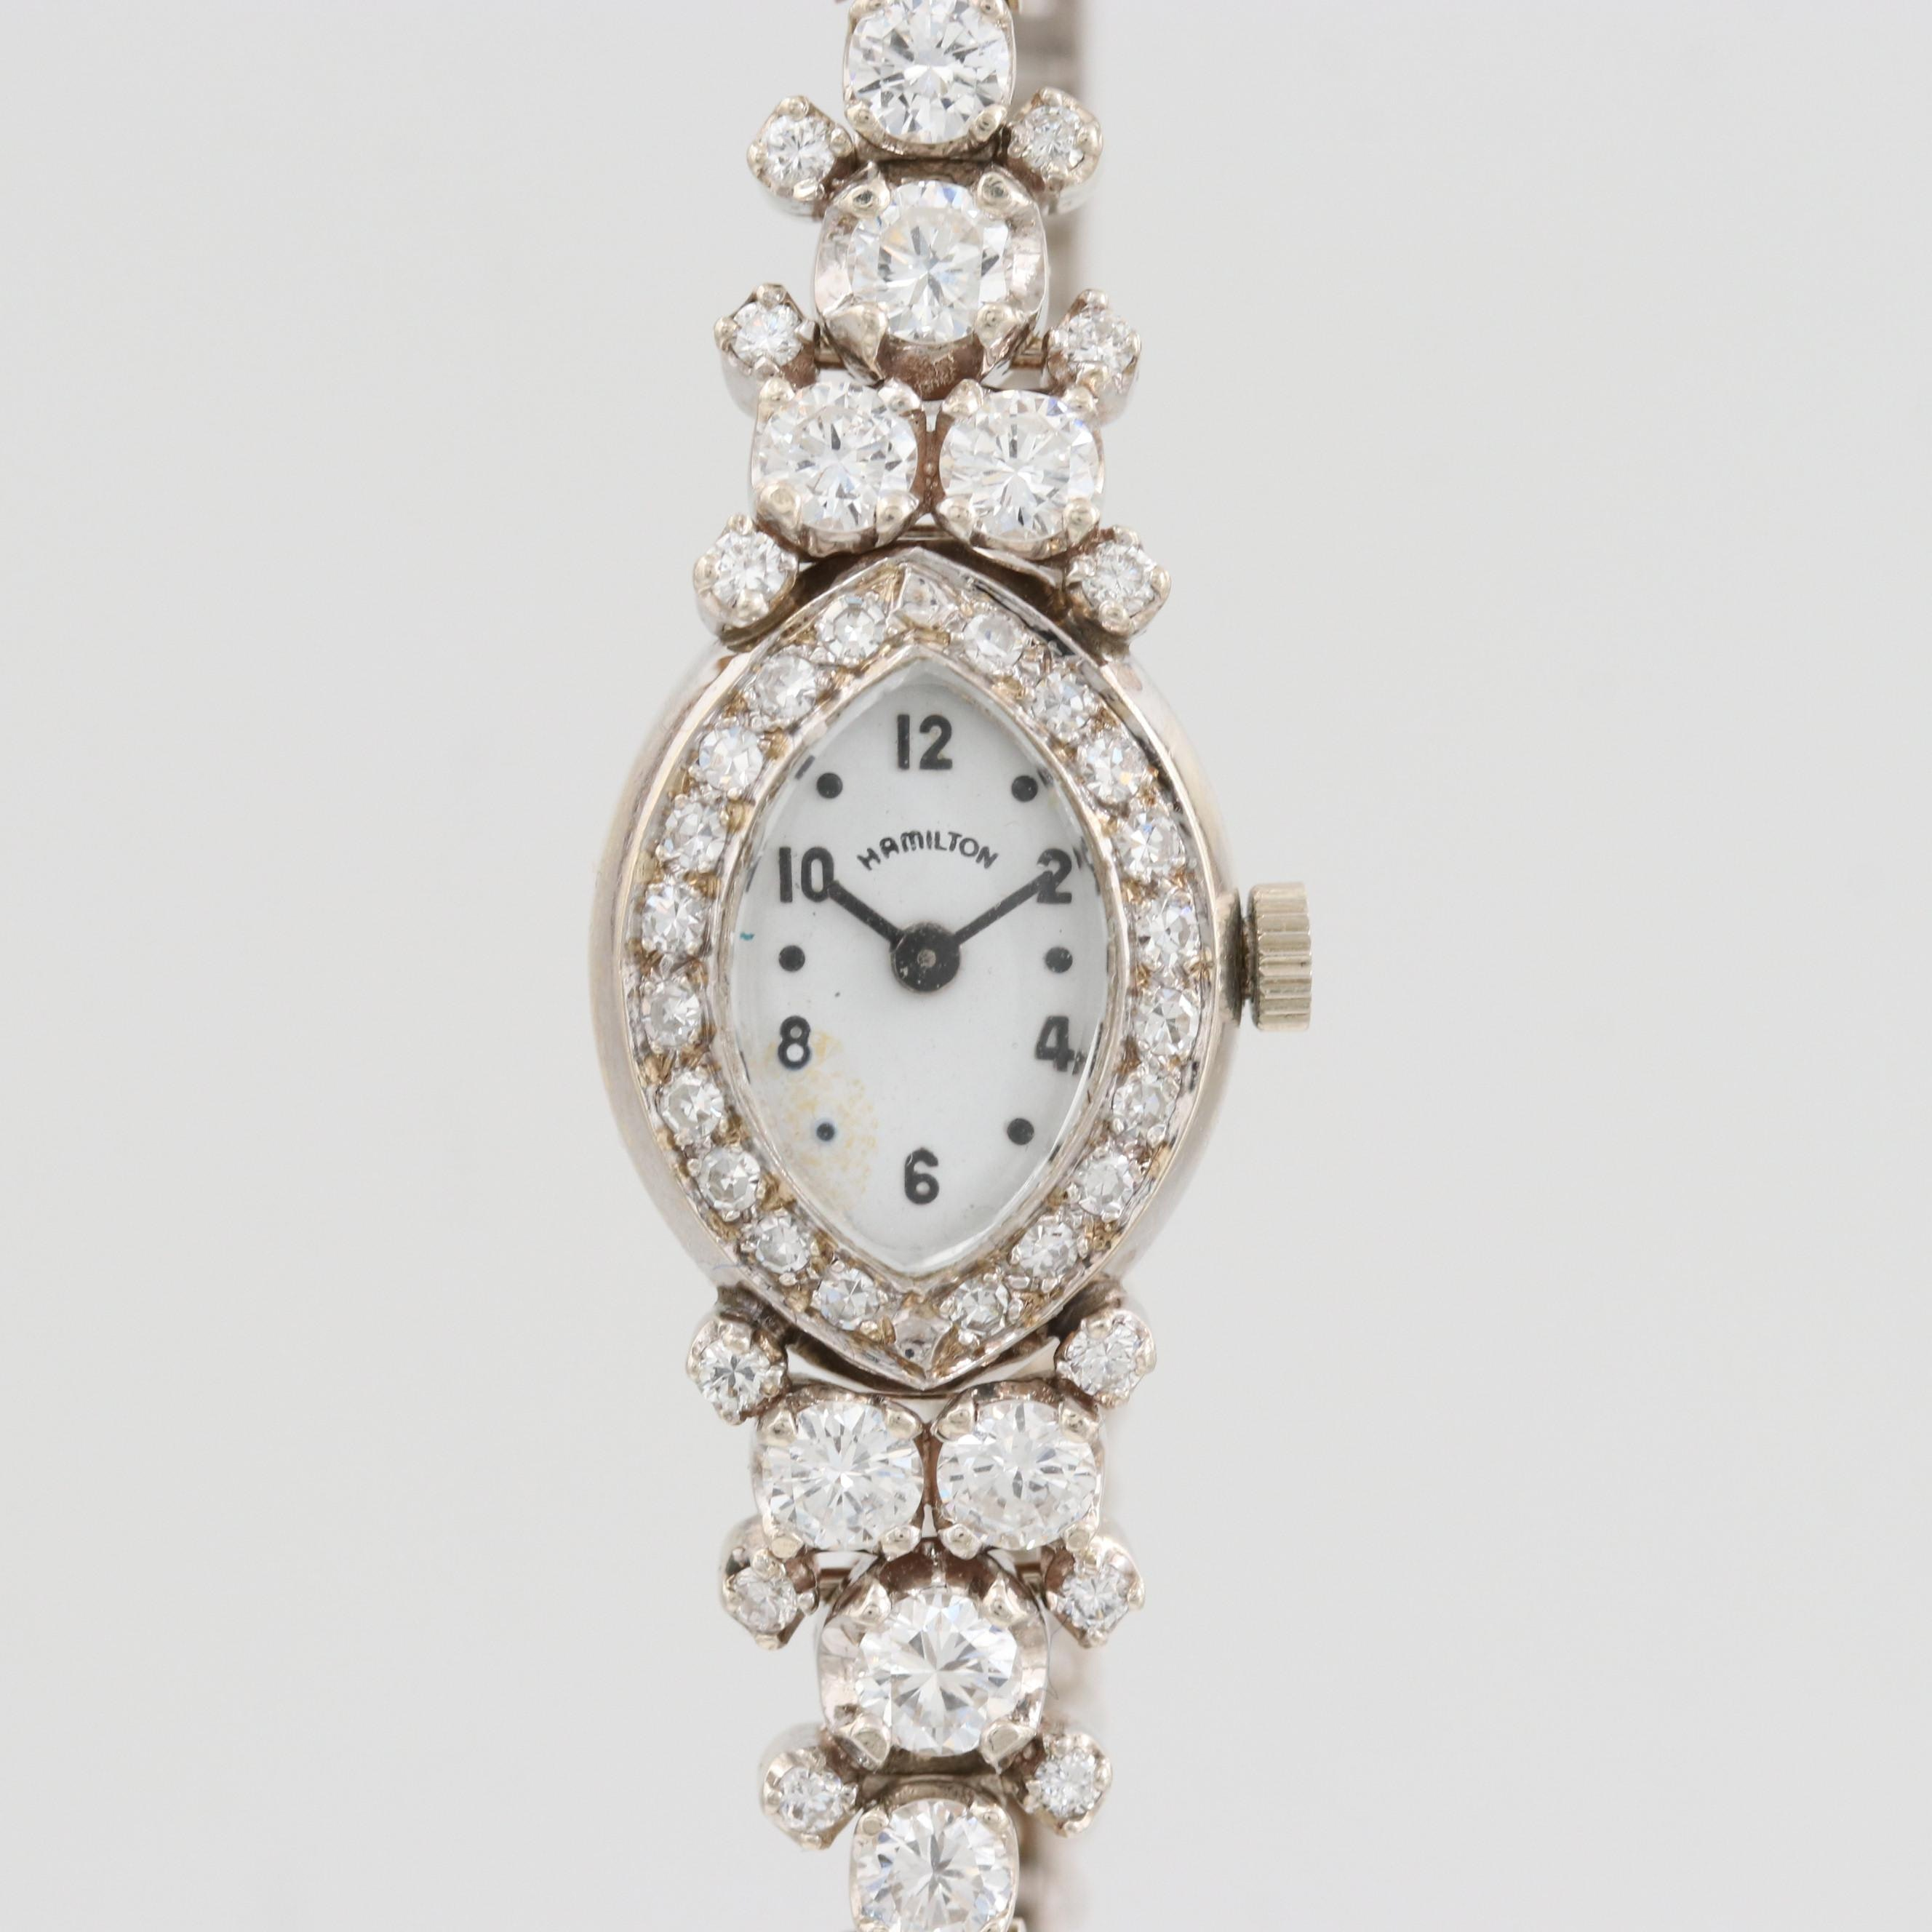 Hamilton 14K White Gold Quartz Wristwatch With 2.31 CTW Diamonds